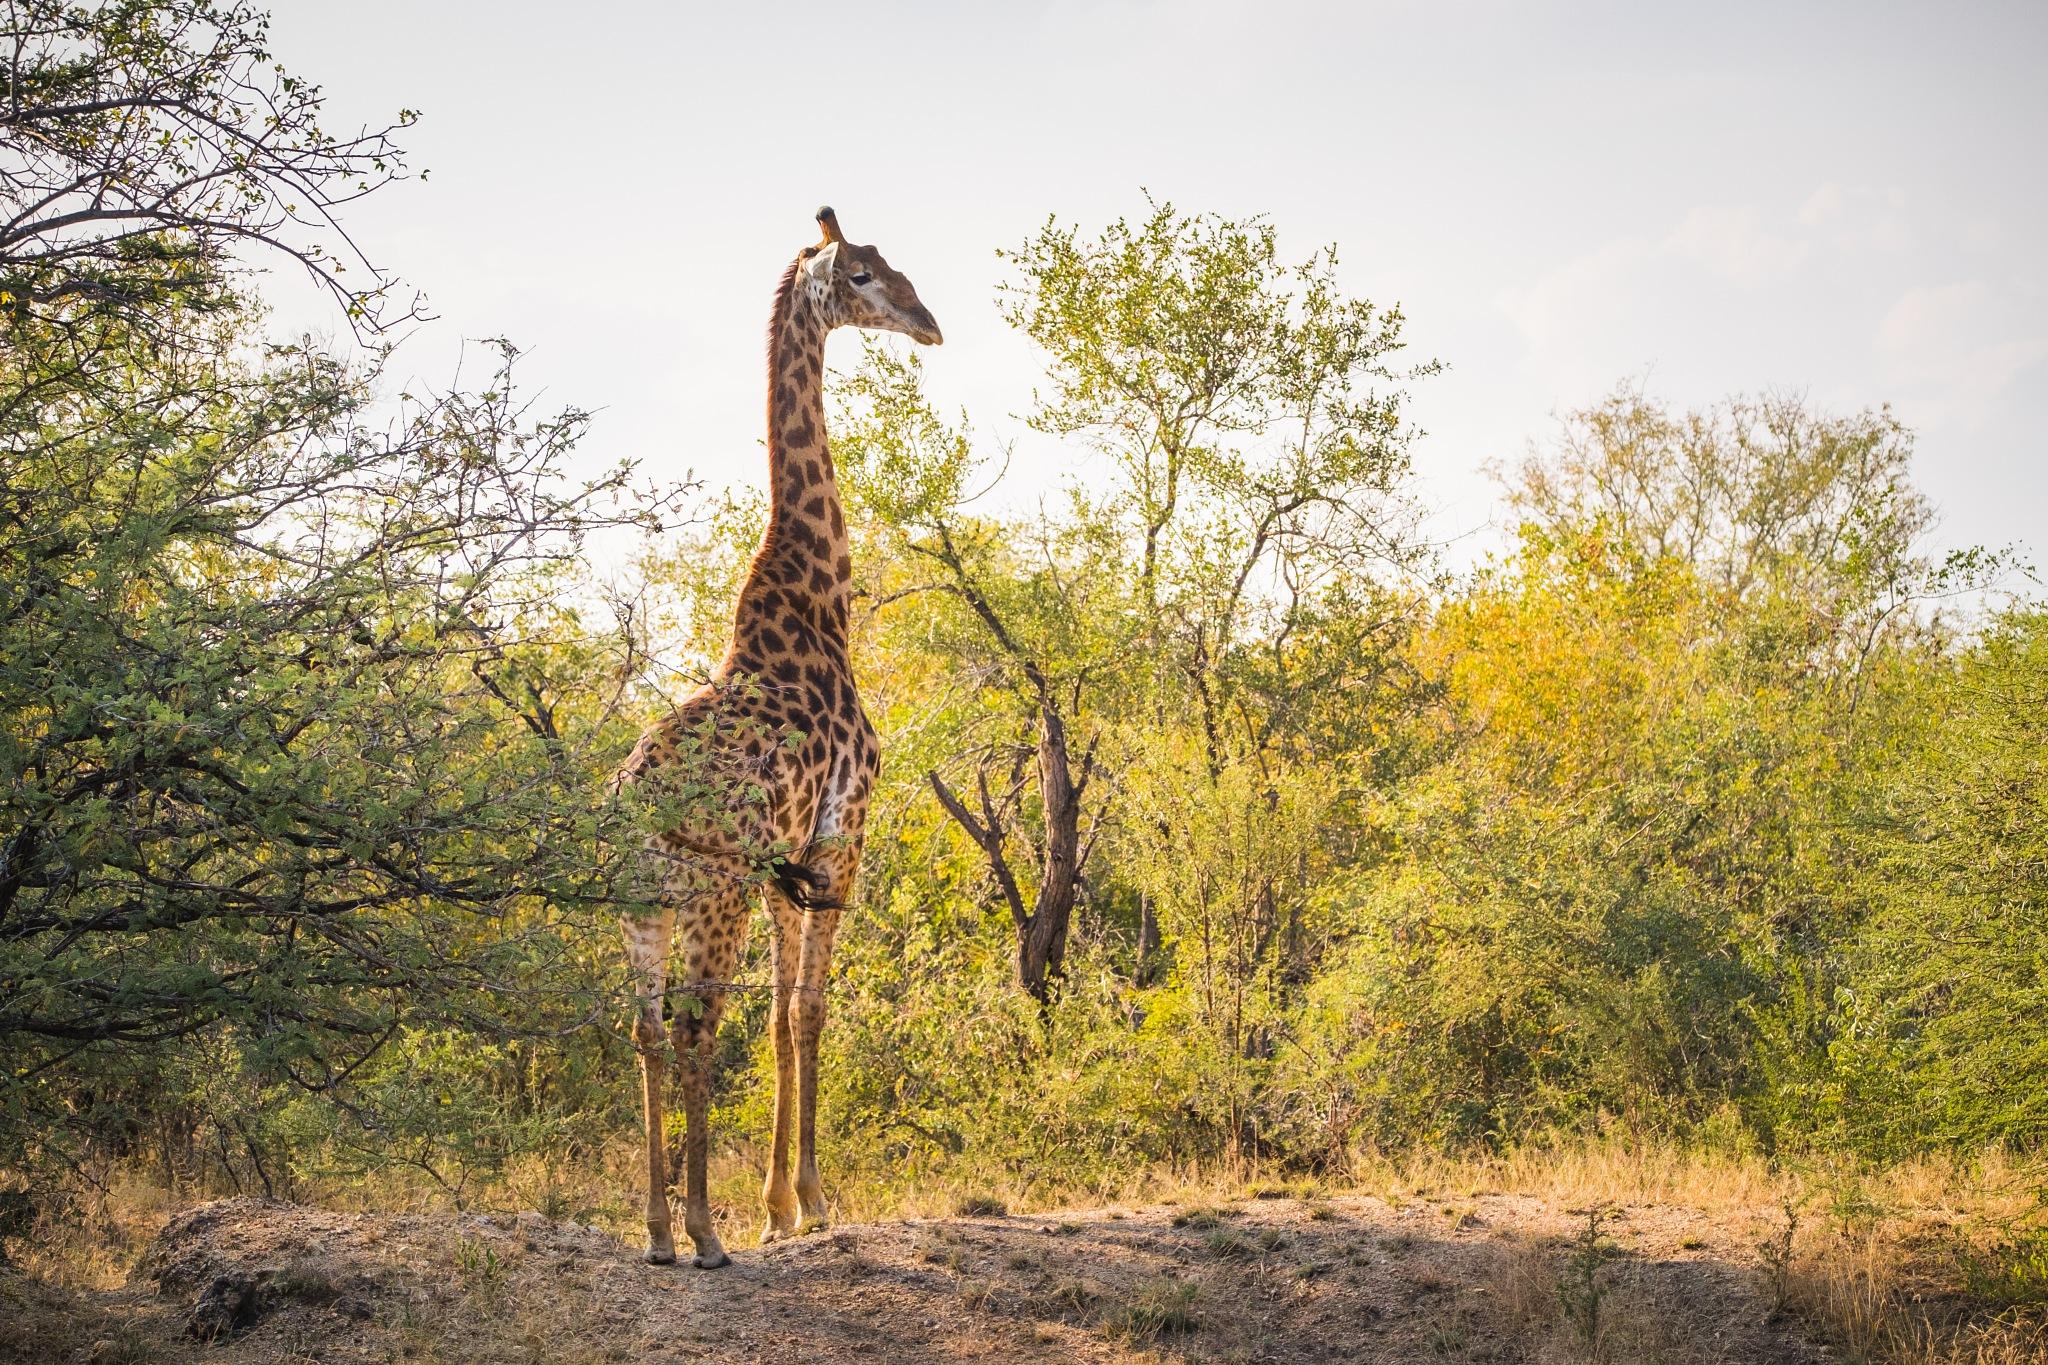 Giraffe by Dimitri Louwet